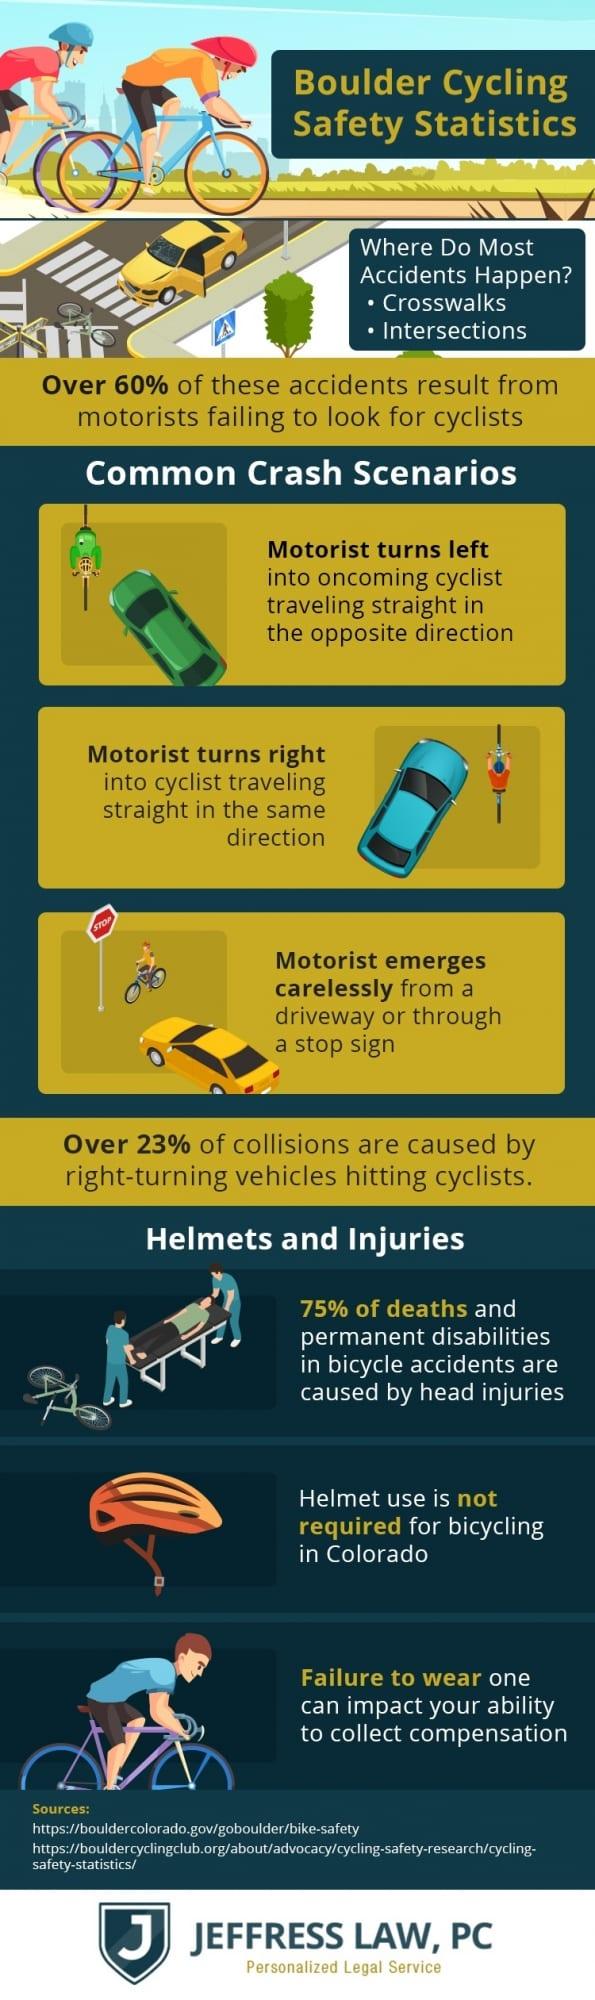 boulder cycling statistics 1